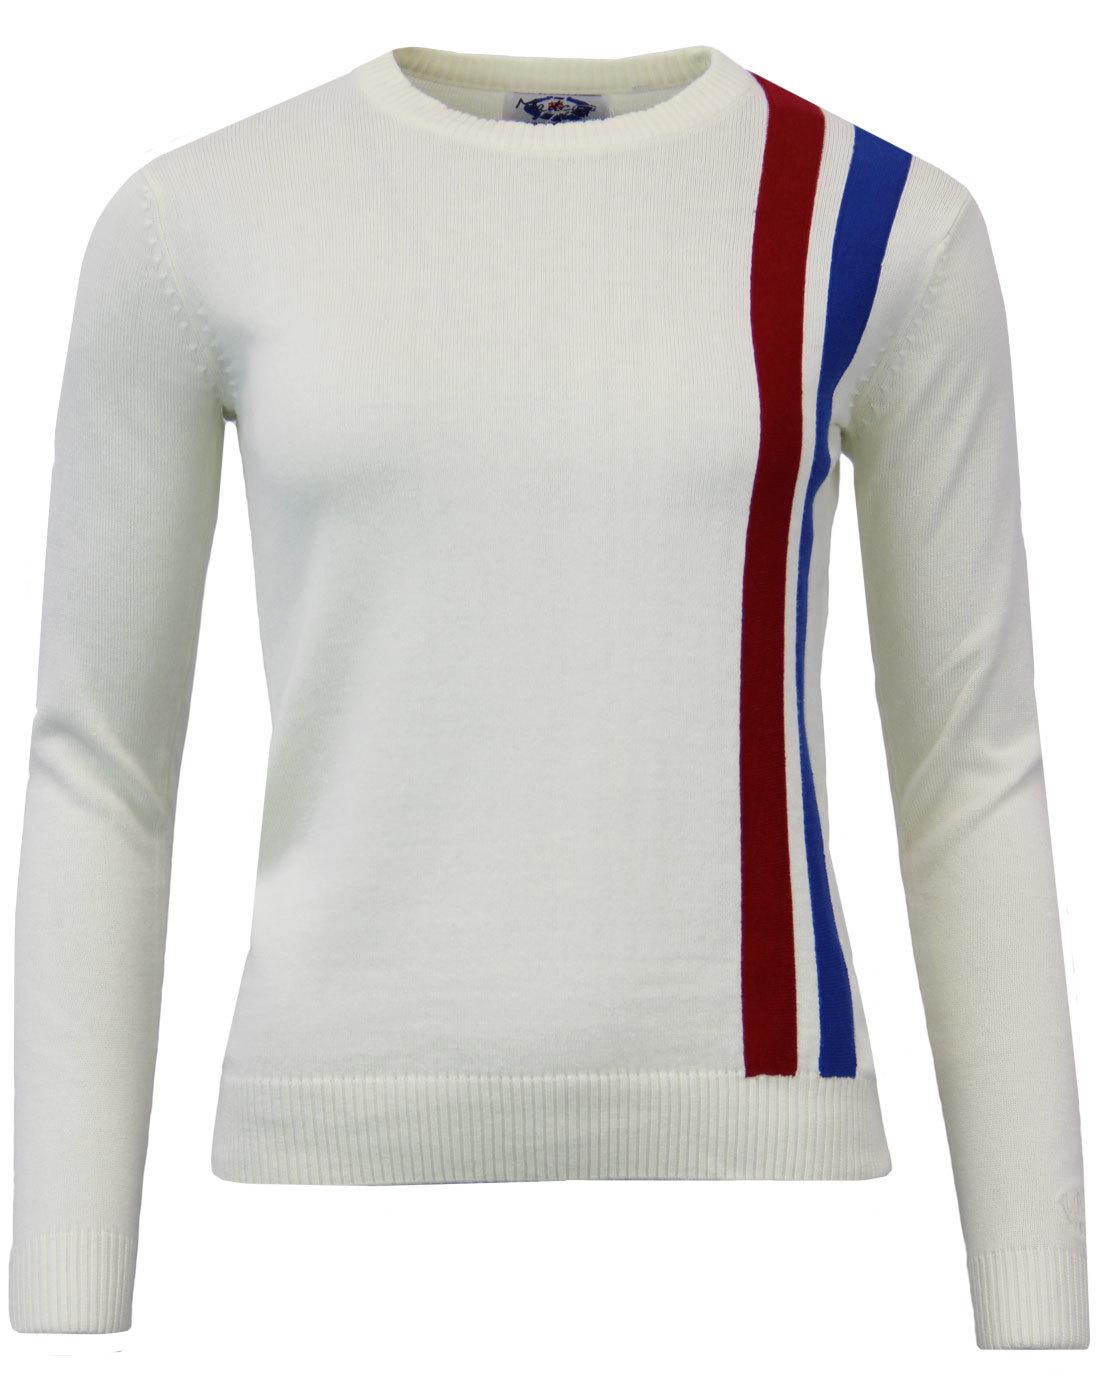 Madcap England 1960s Mod Womens Racing Jumper (WW)